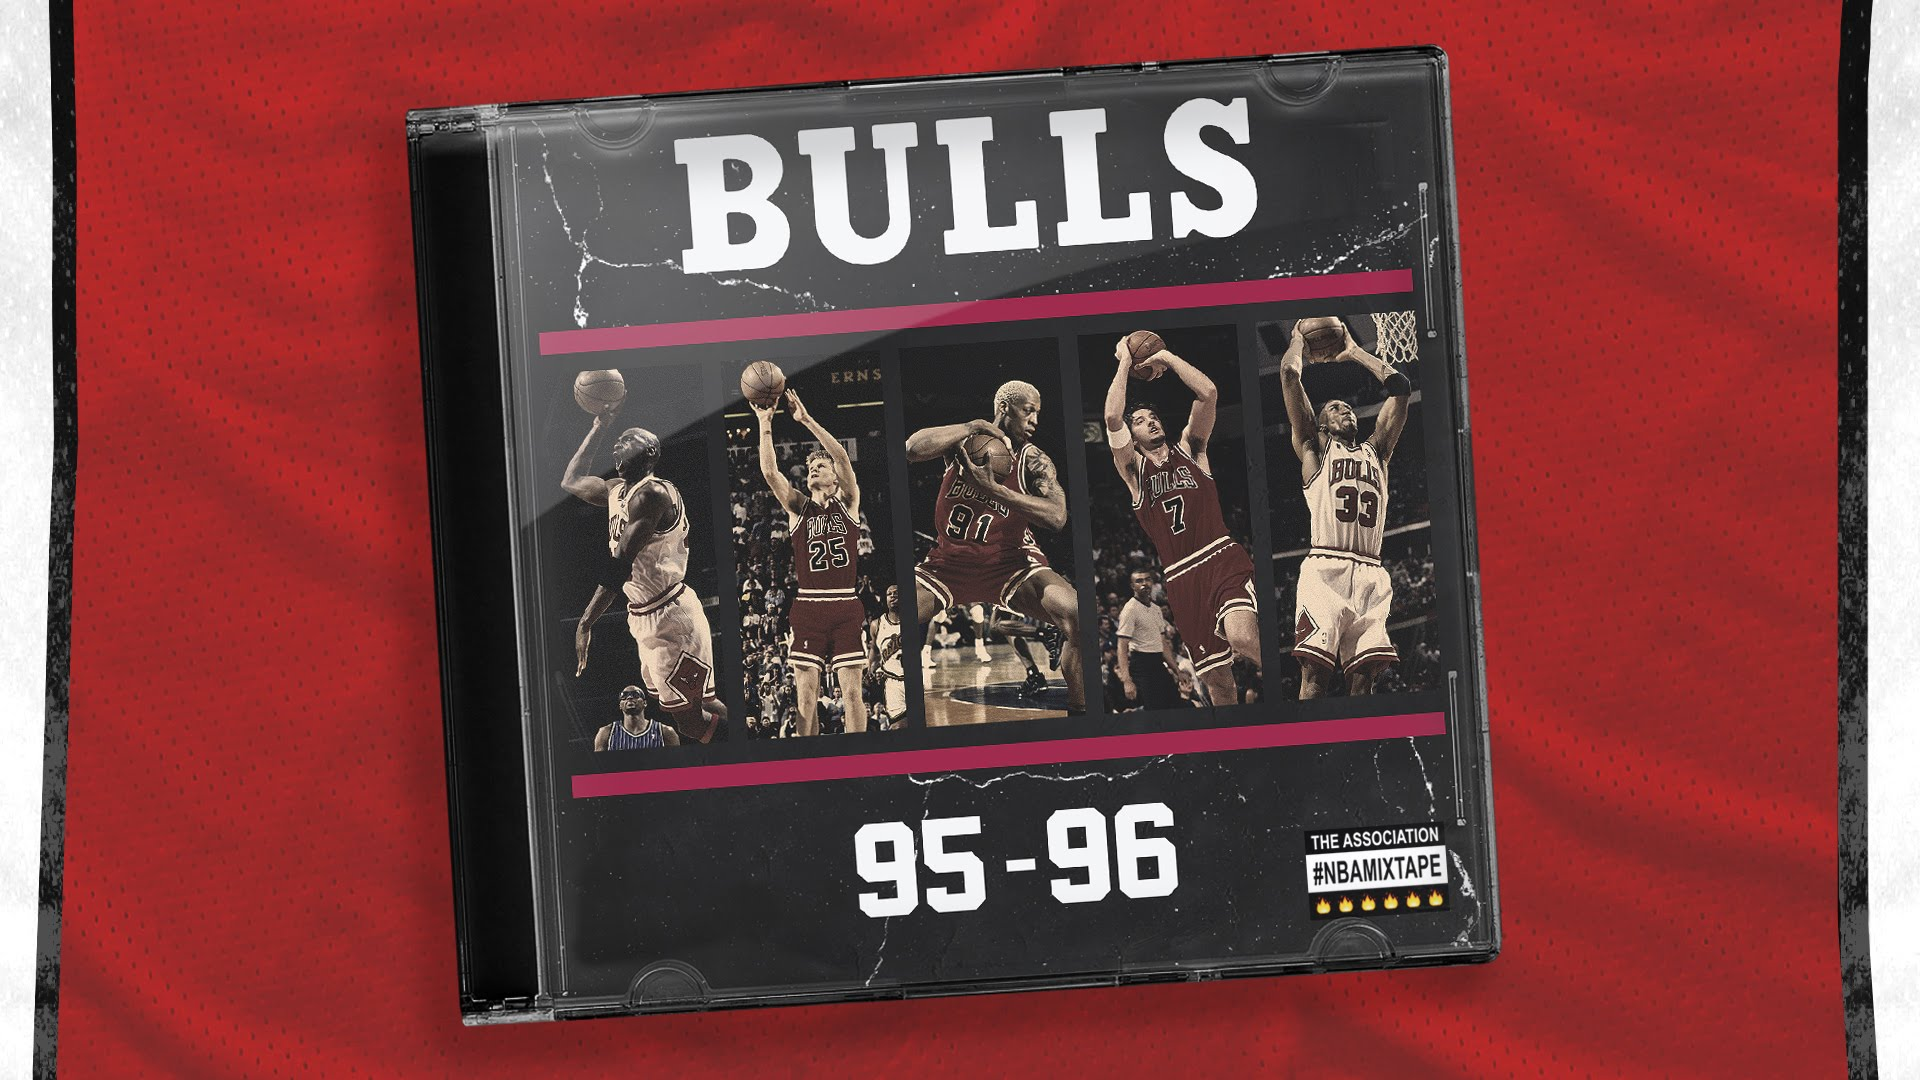 Highlight tape of the '95-'96 Chicago Bulls 72 win team